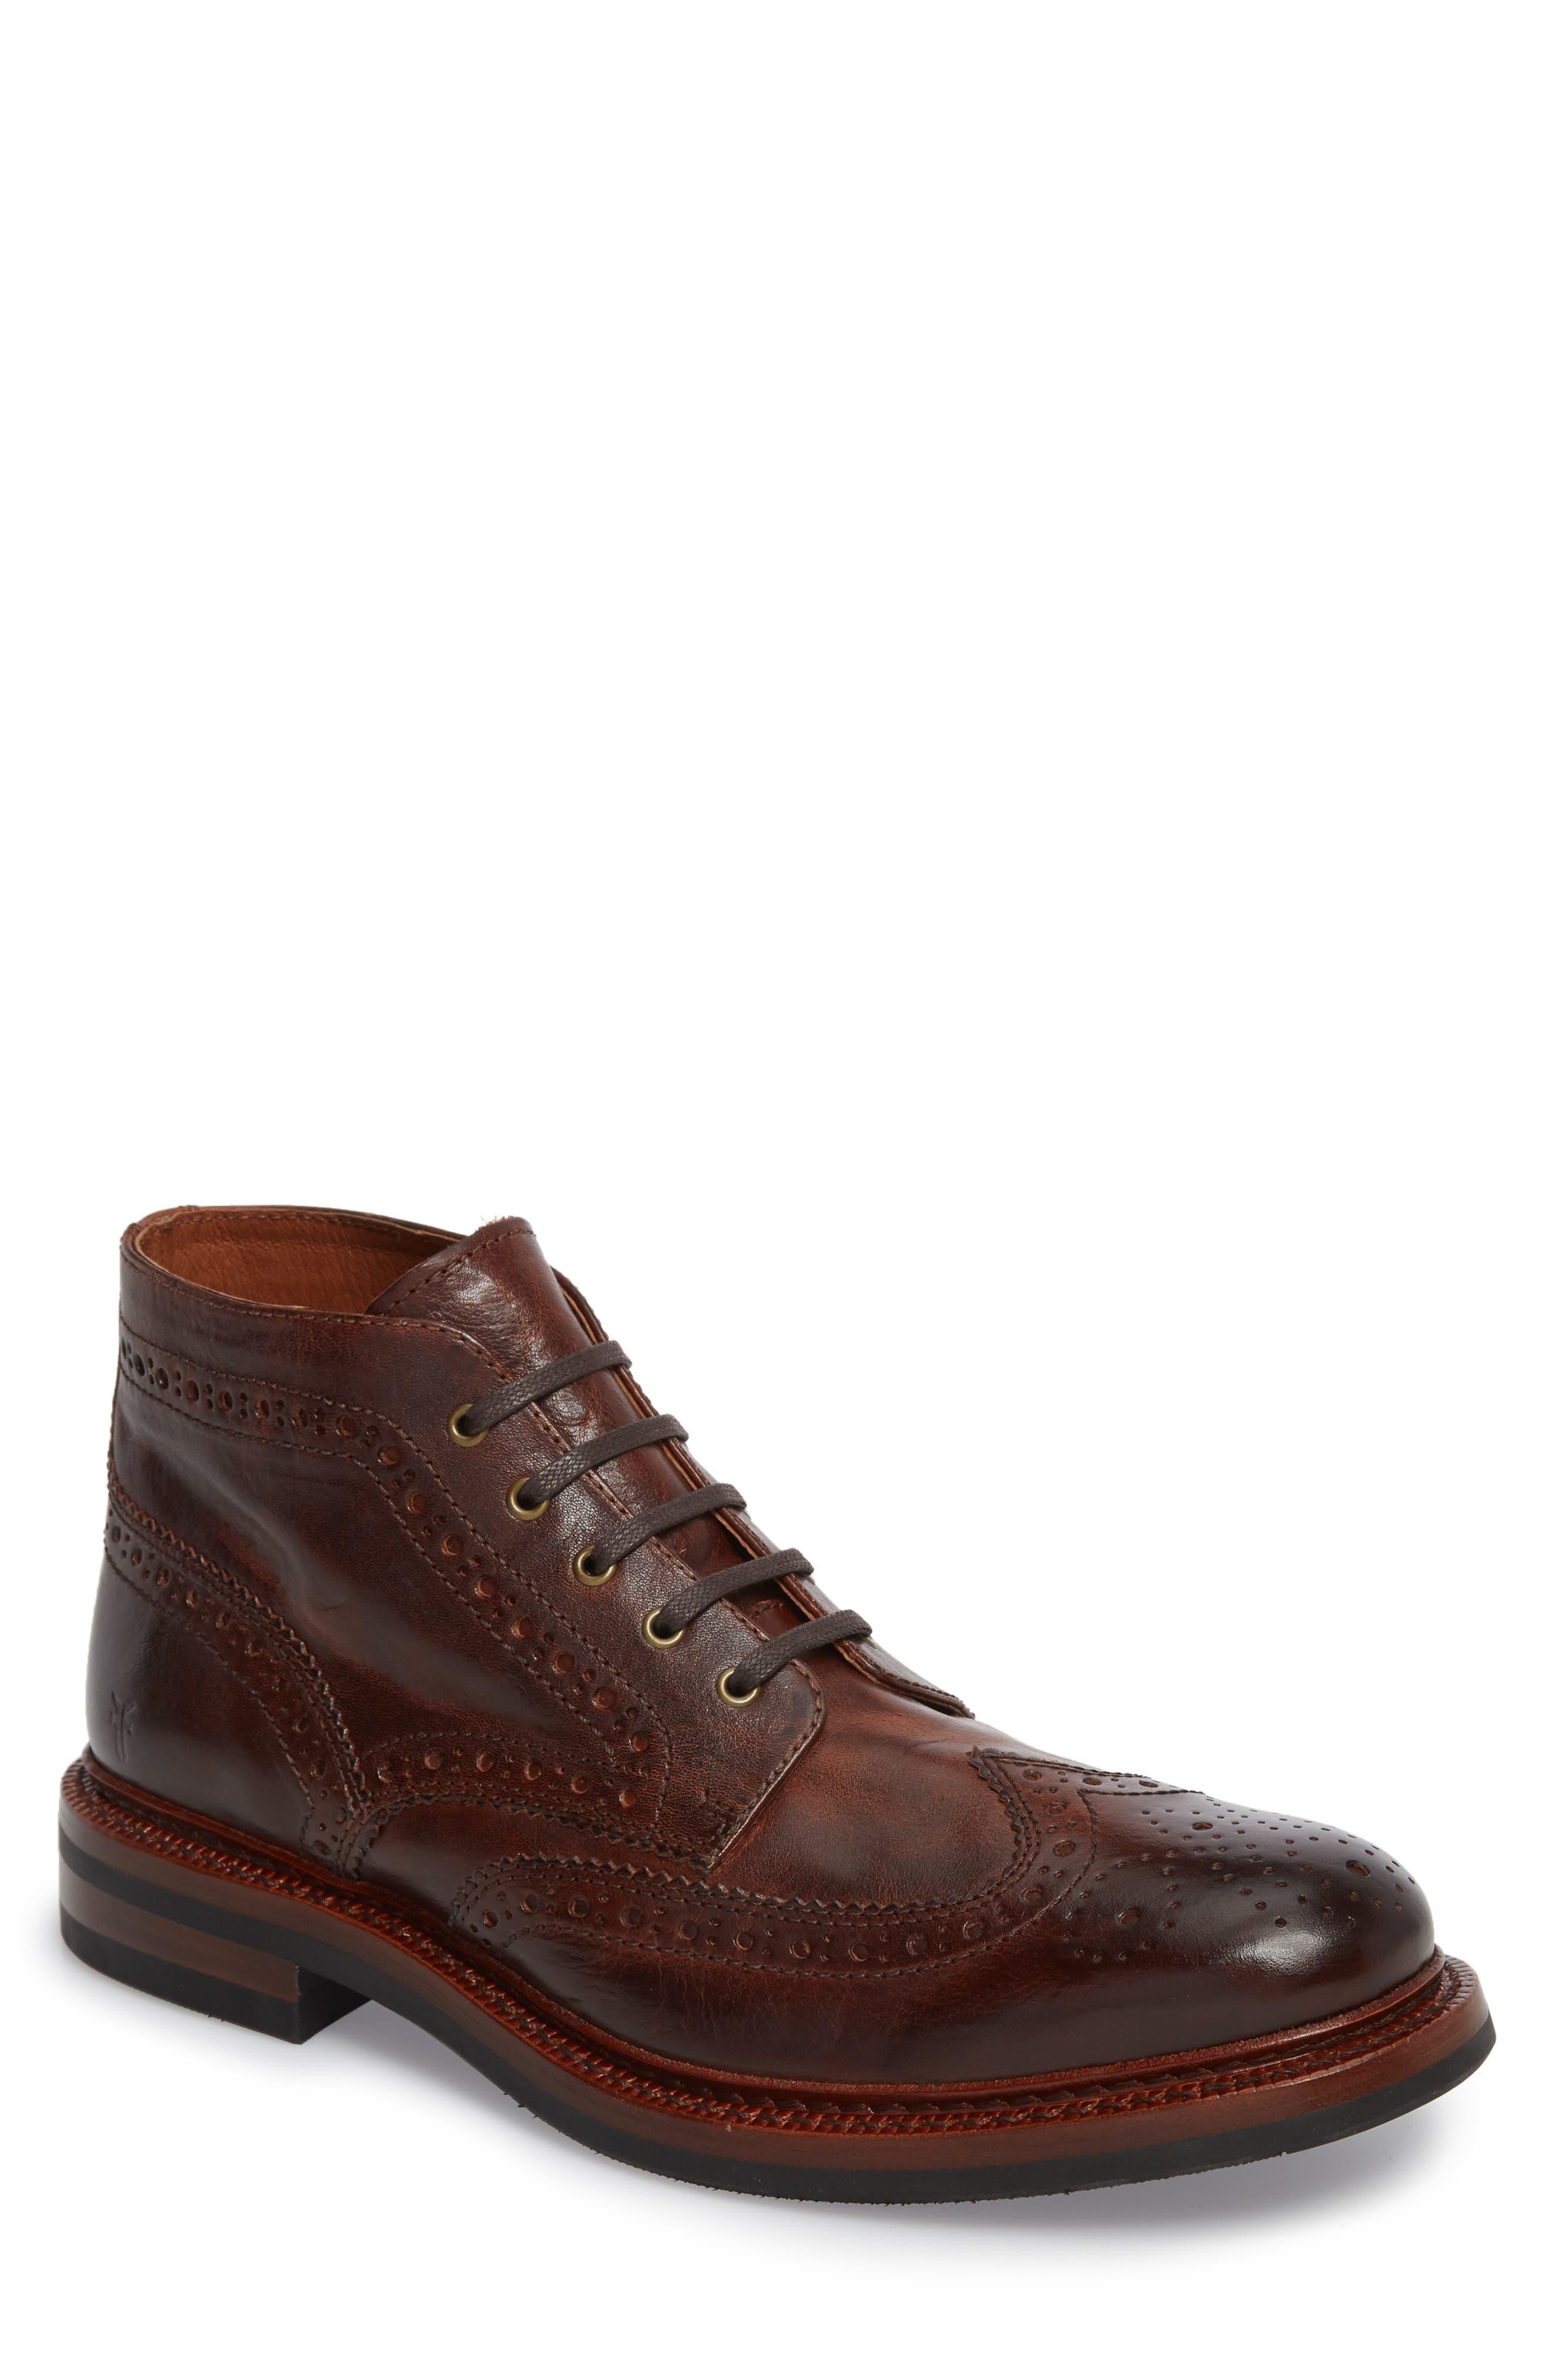 Graham Wingtip Boot,                         Main,                         color, Cognac Leather